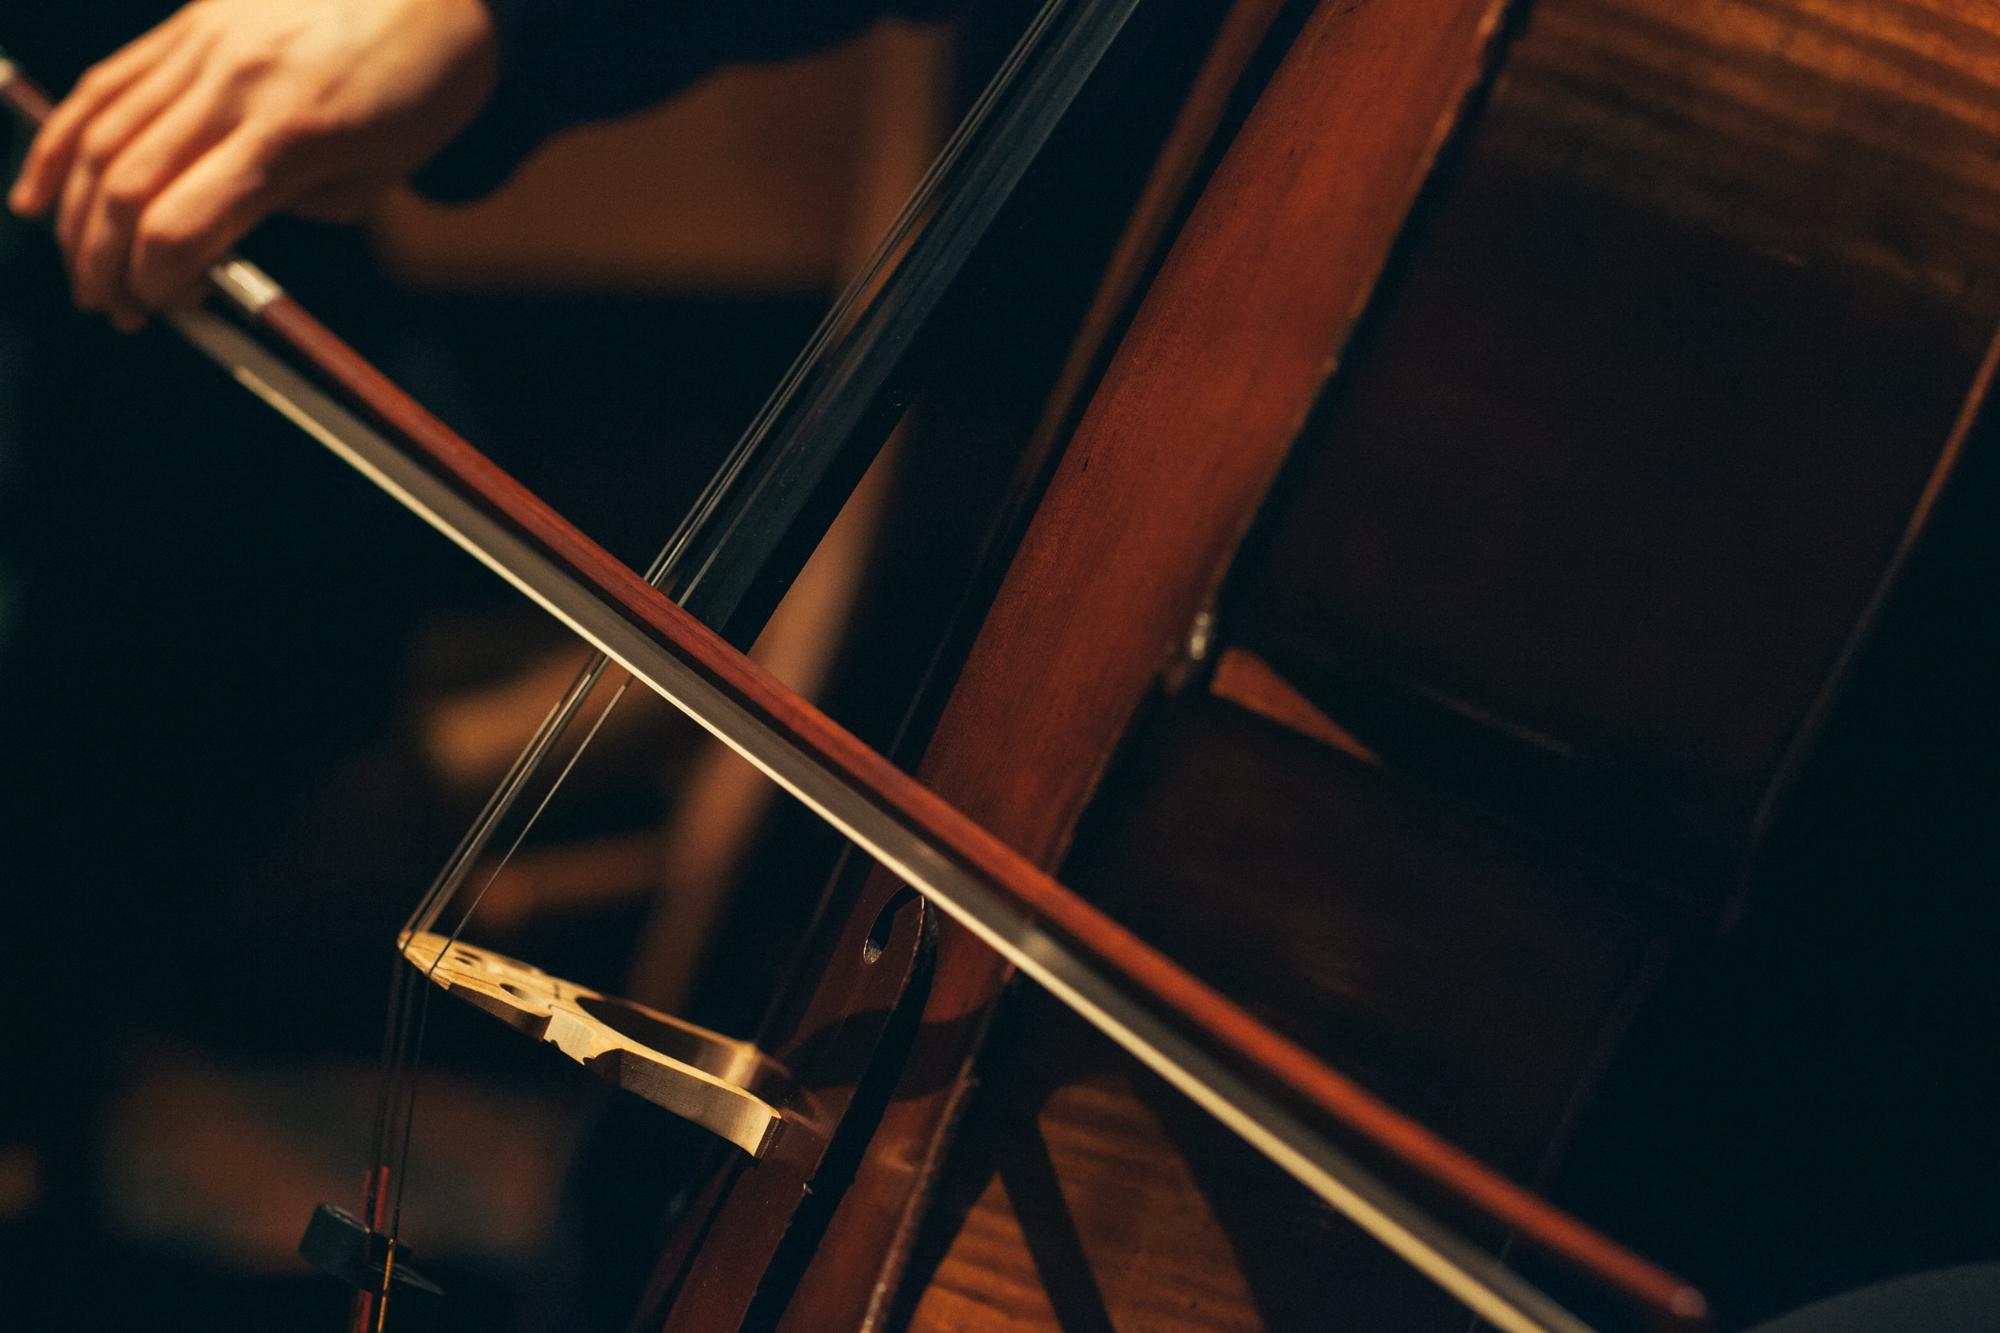 AVIVA Strings:  Elegant Live  Strings  For Weddings, Events, &  Special Occasions. Serving  Northeastern Pennsylvania,Wilkes-Barre, Scranton, the Poconos, the Lehigh Valley, Philadelphiaand beyond!